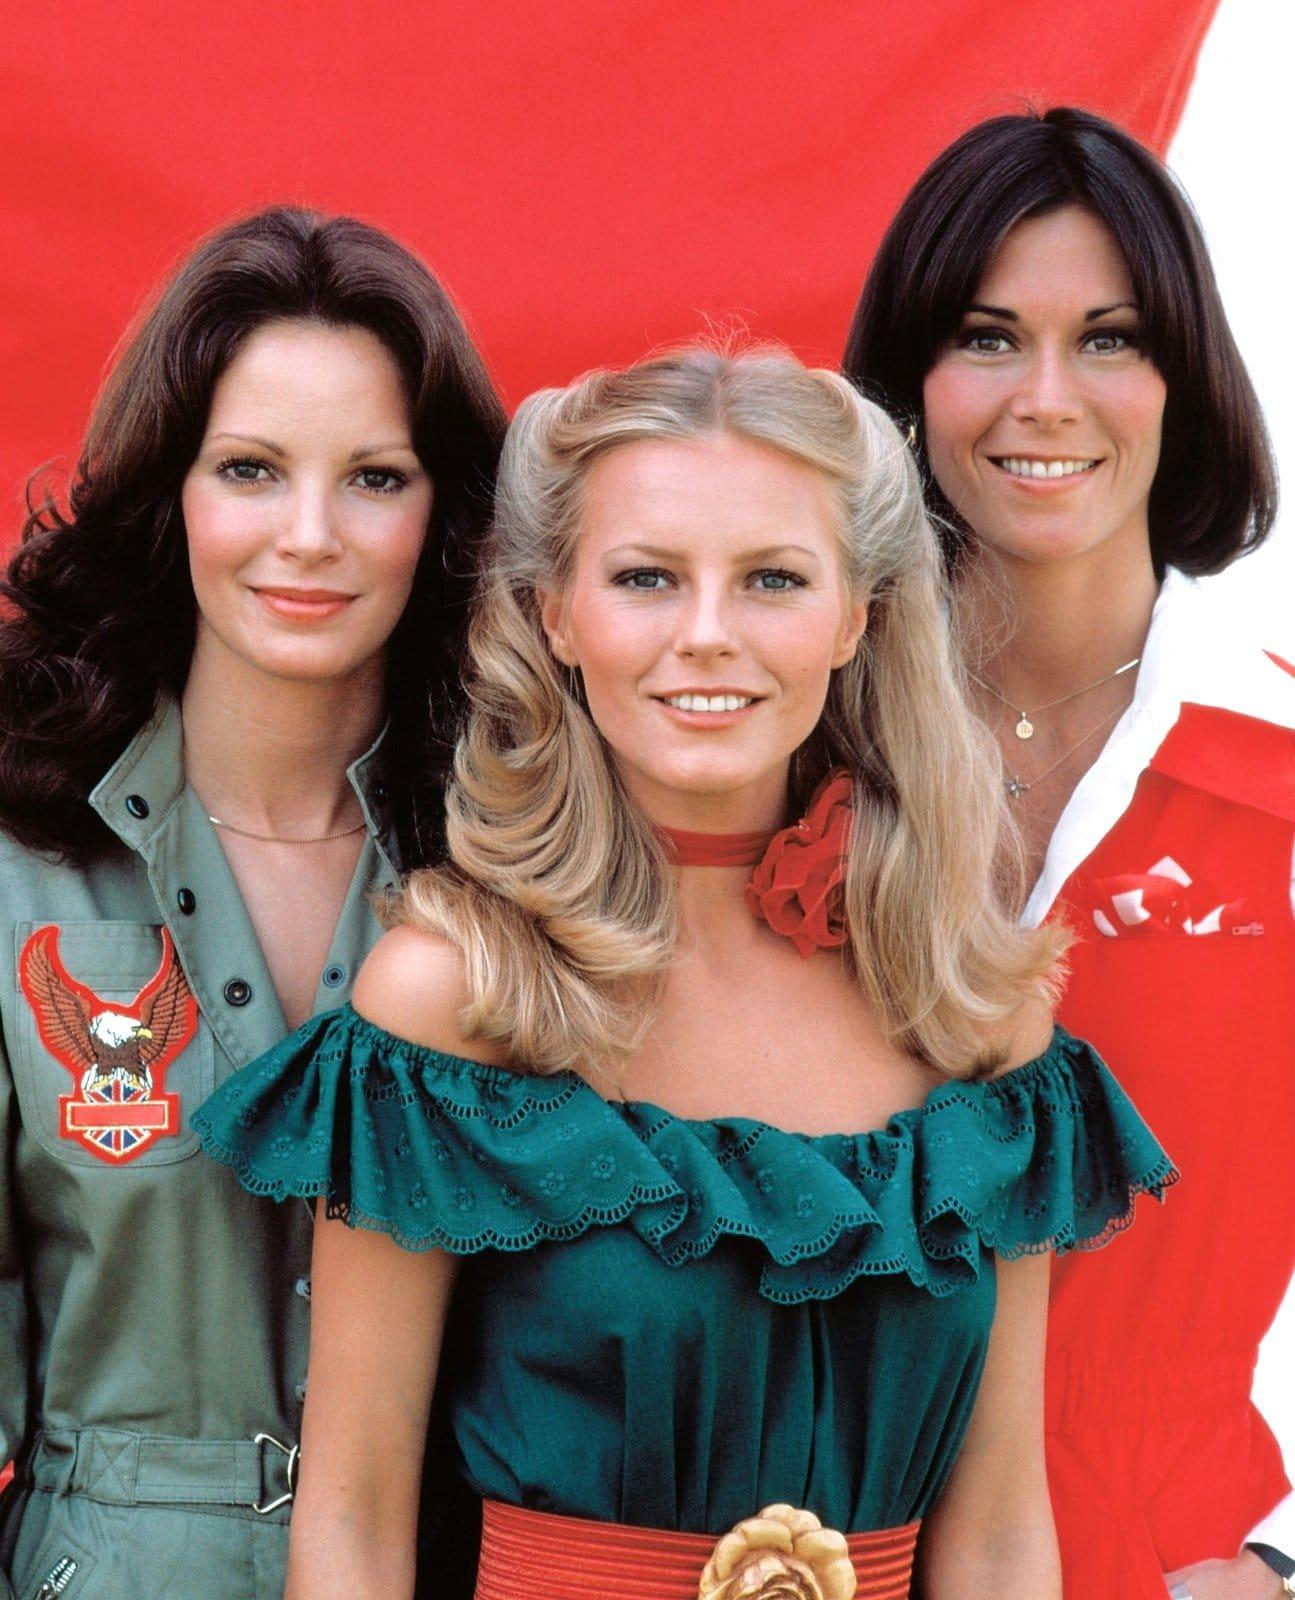 Vintage Charlie's Angels main cast members - late 1970s